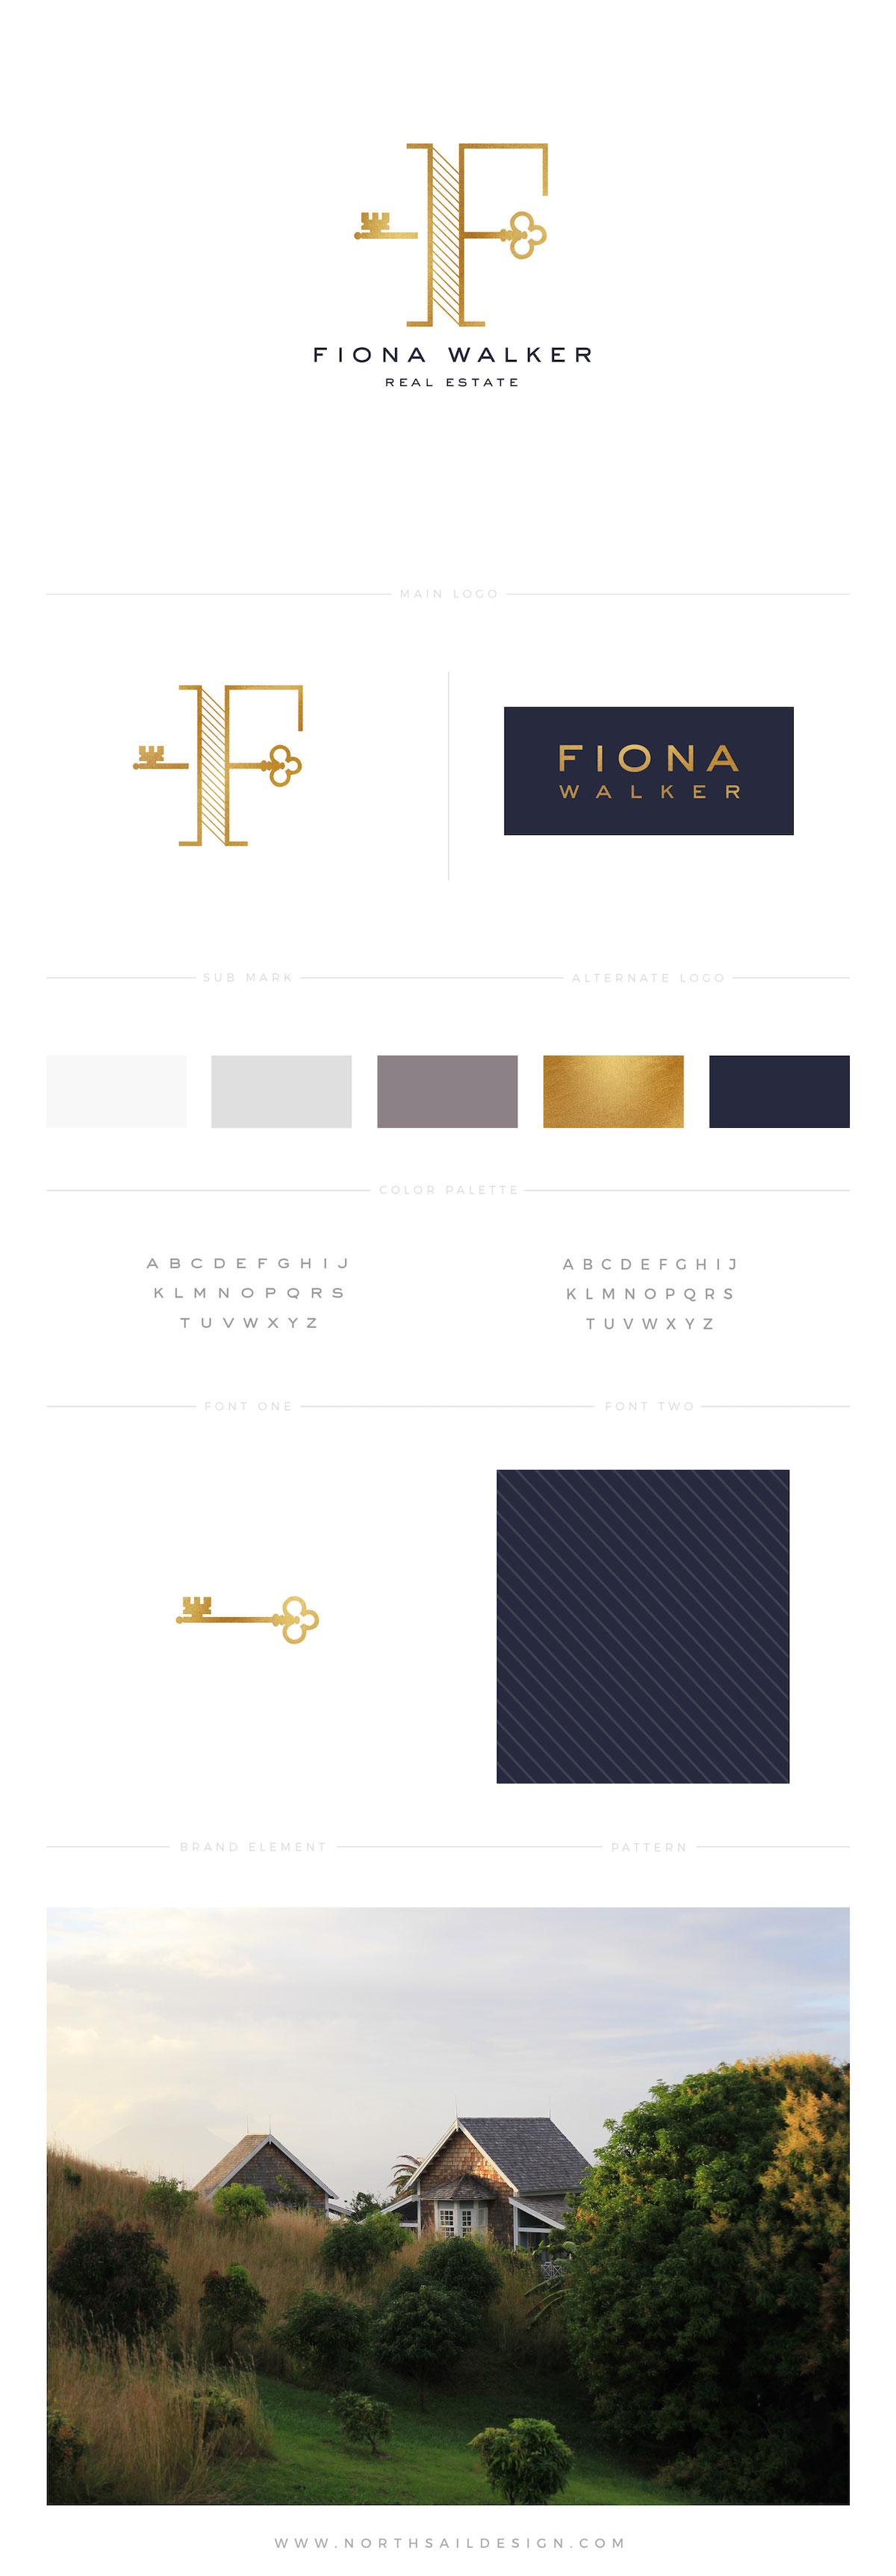 Fiona-Walker-Real-Estate-Brand-Board-Realtor-Logo-Custom-Logo-Real-Estate-Logo-Modern-Gold-Foil-1